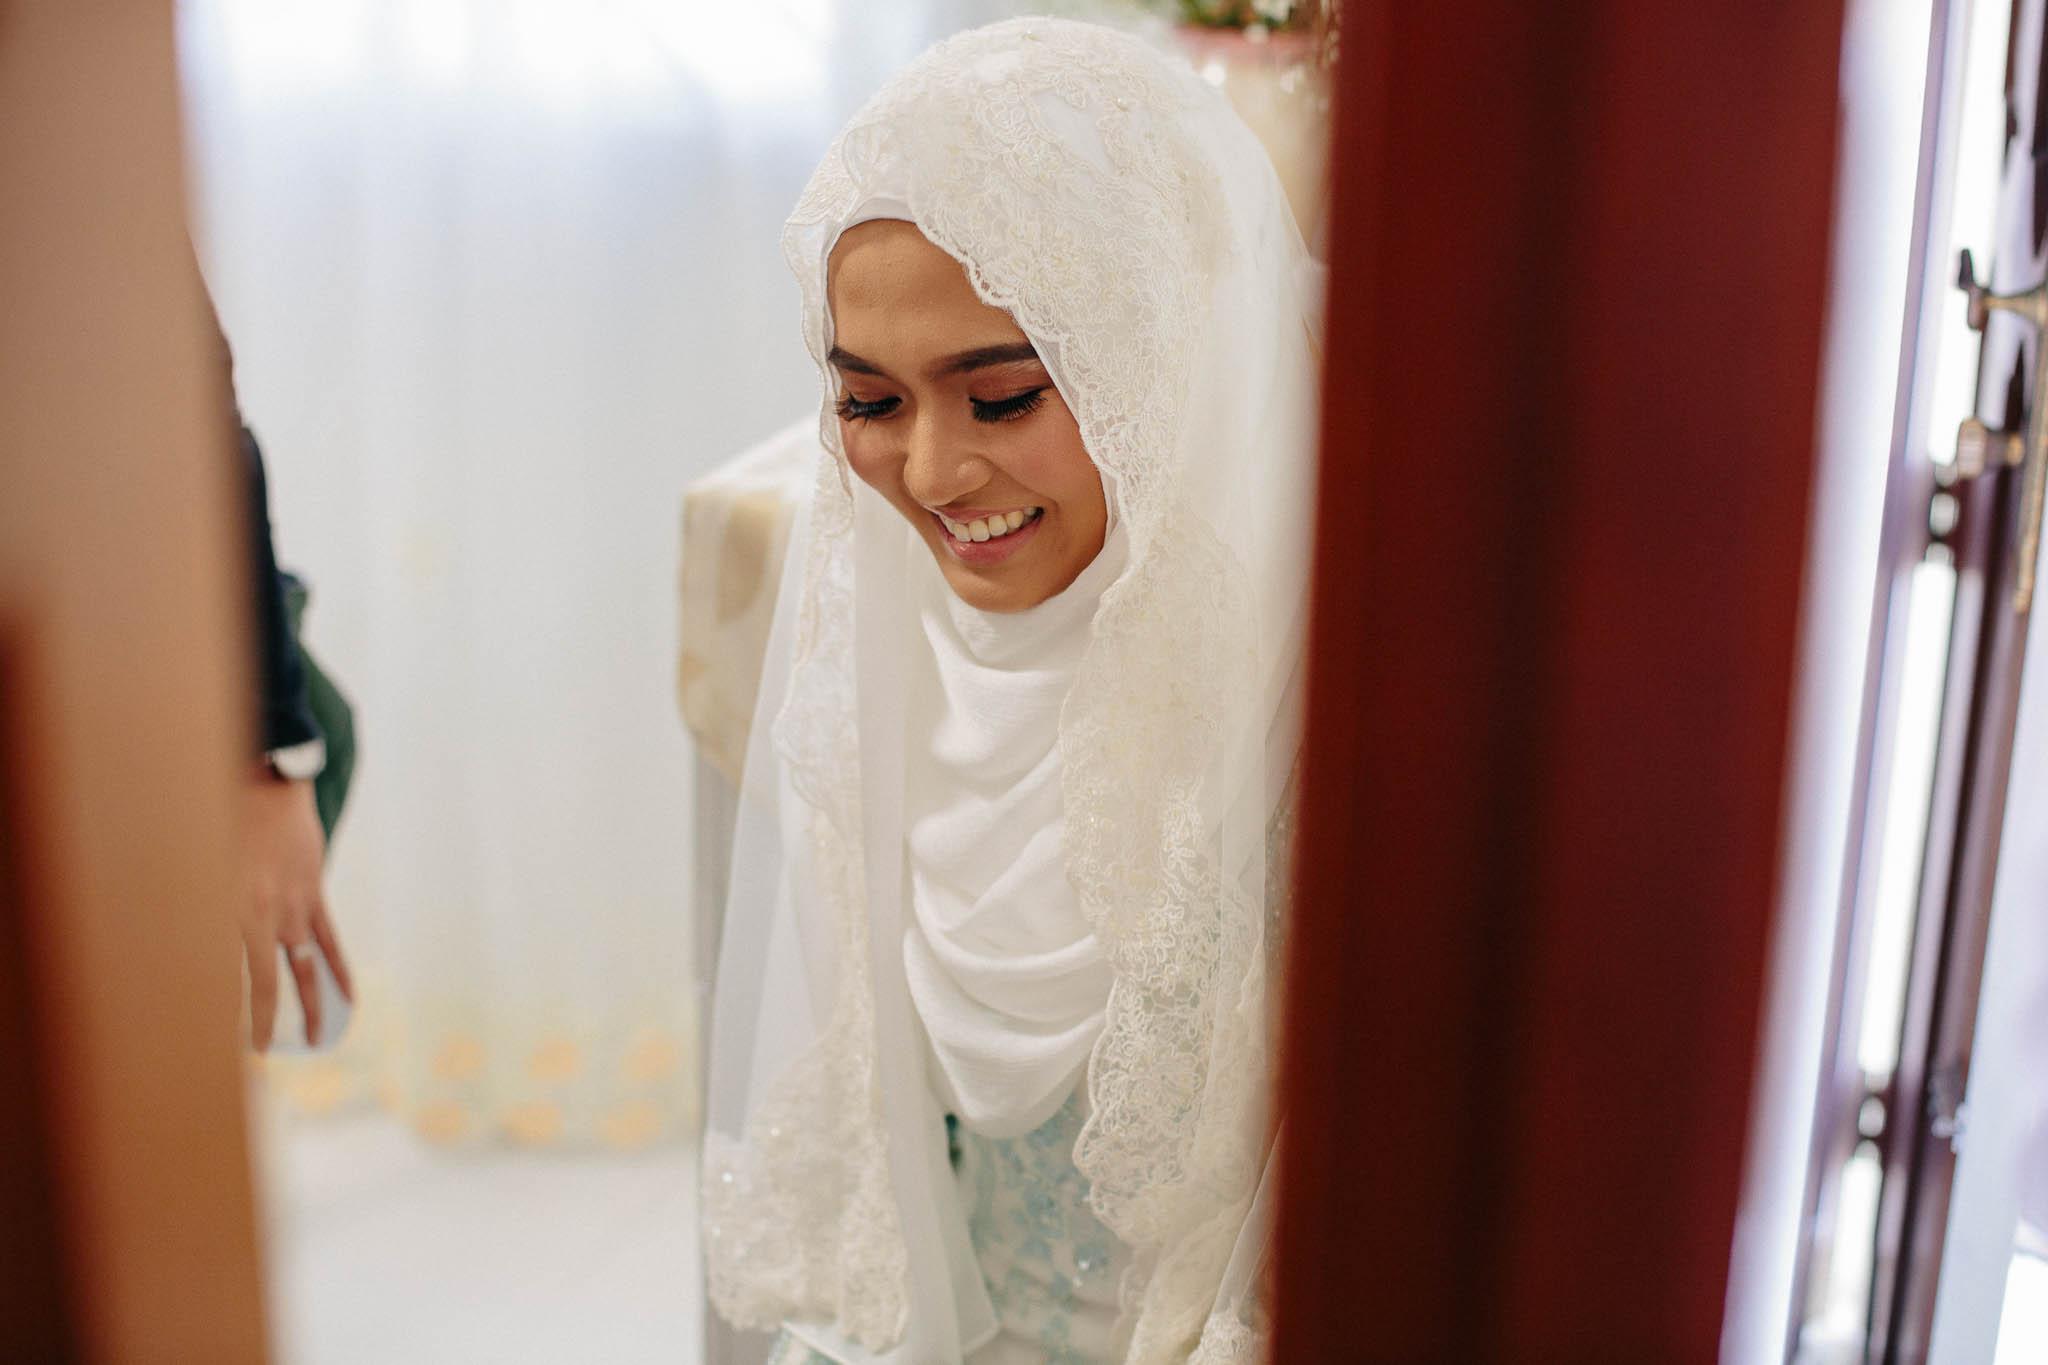 singapore-wedding-photographer-sharalyn-syazwan-014.jpg